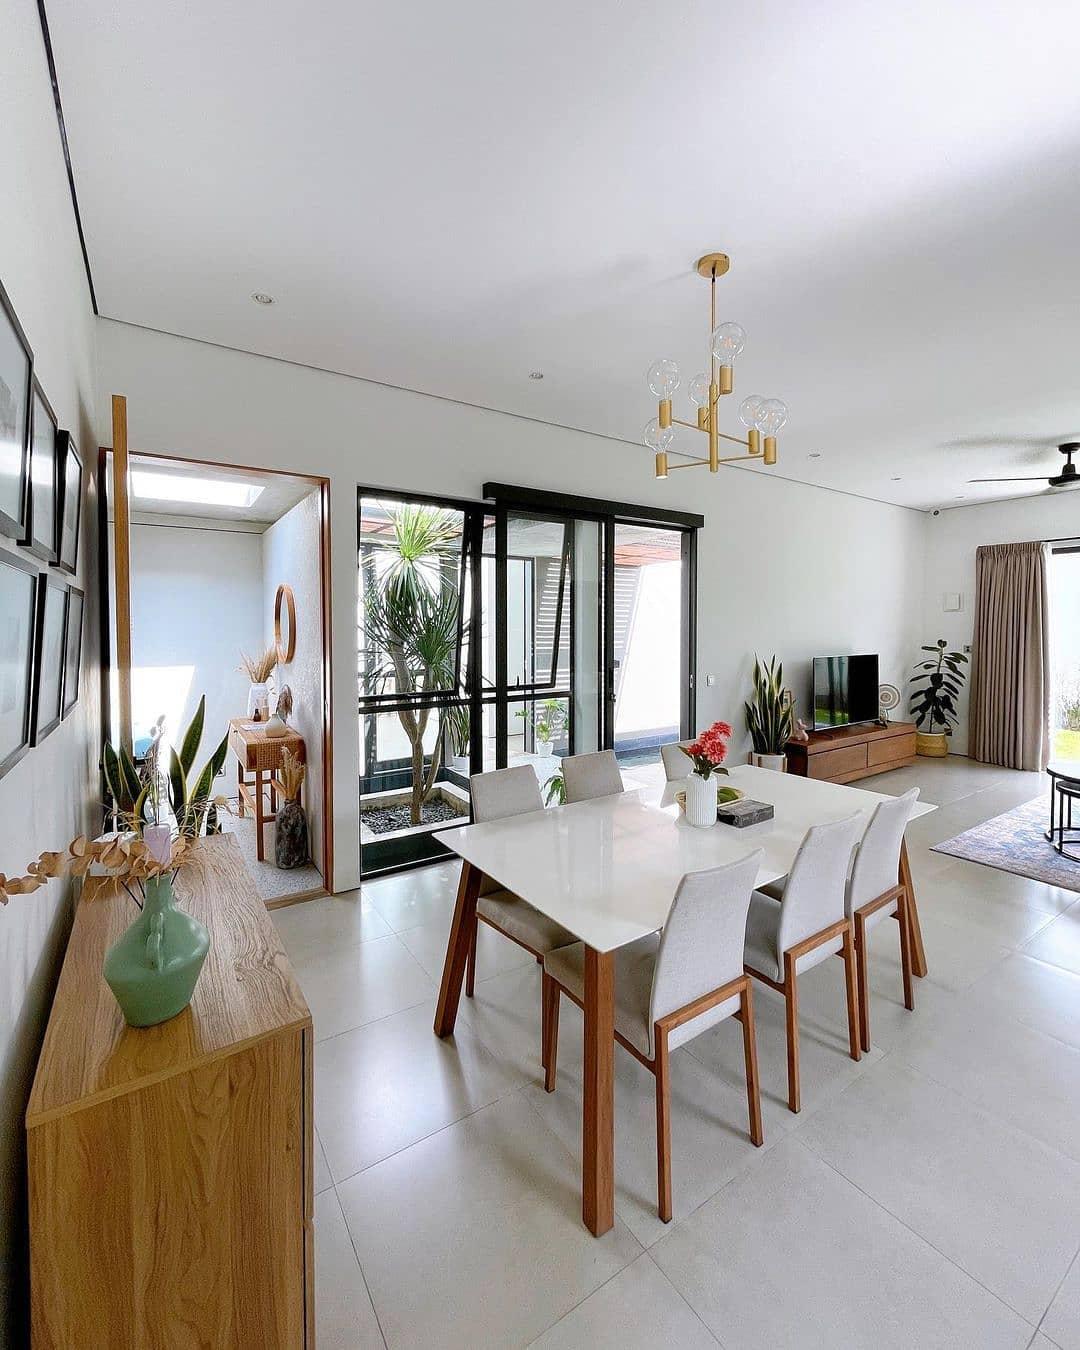 ruang makan minimalis bernuansa putih